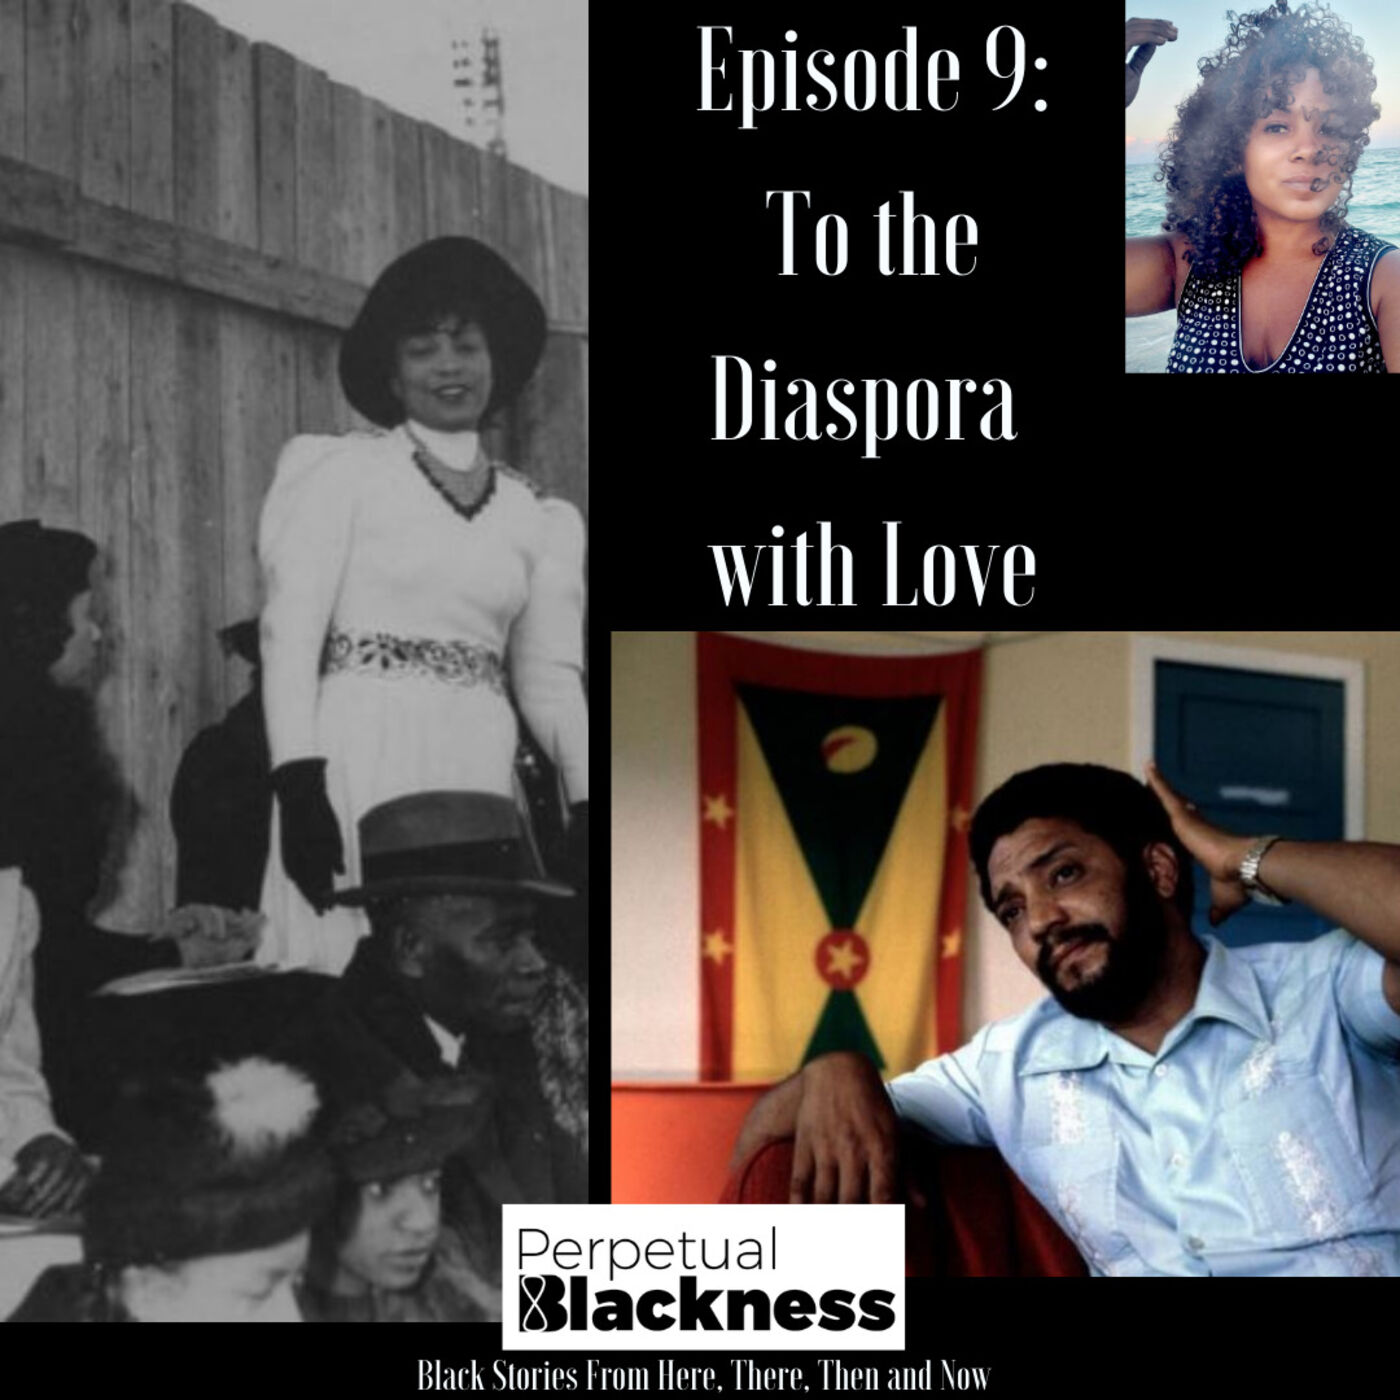 Episode 9: To the Diaspora with Love